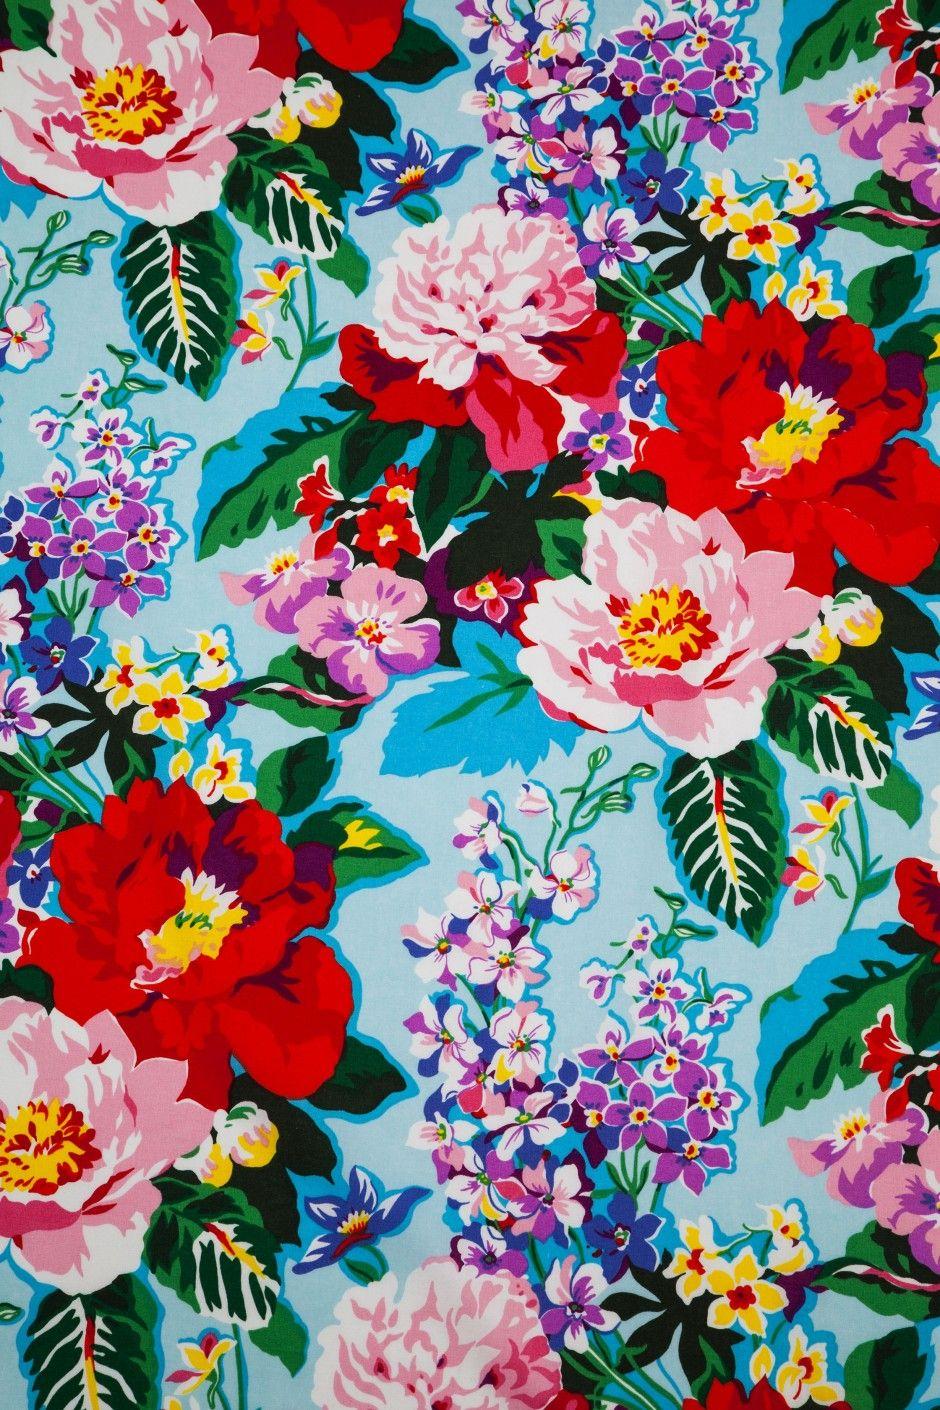 Greenbrier Dorothy Draper Fabrics and Wallcoverings